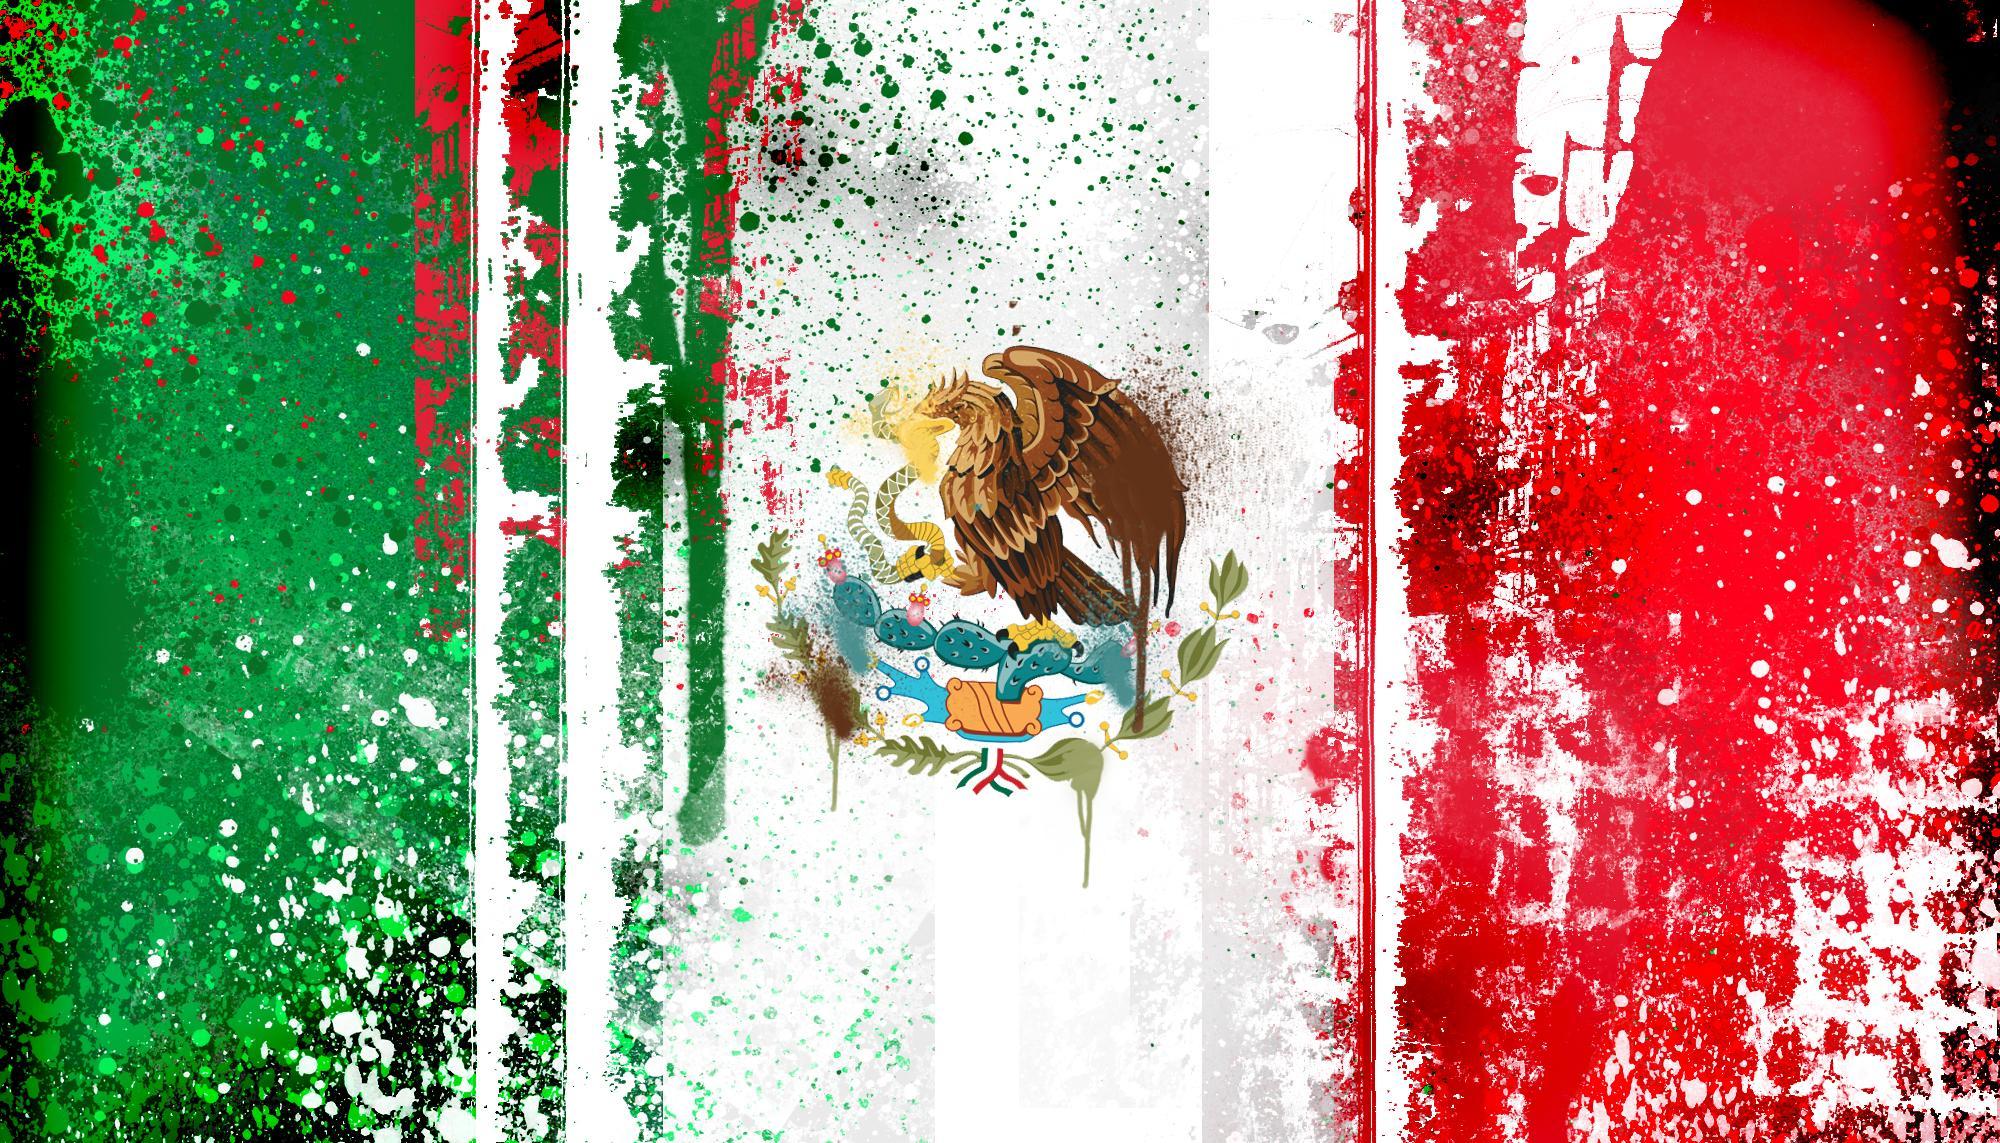 Mexico Flag Wallpaper 2000x1143px 851927   Clip Art Library 2000x1143